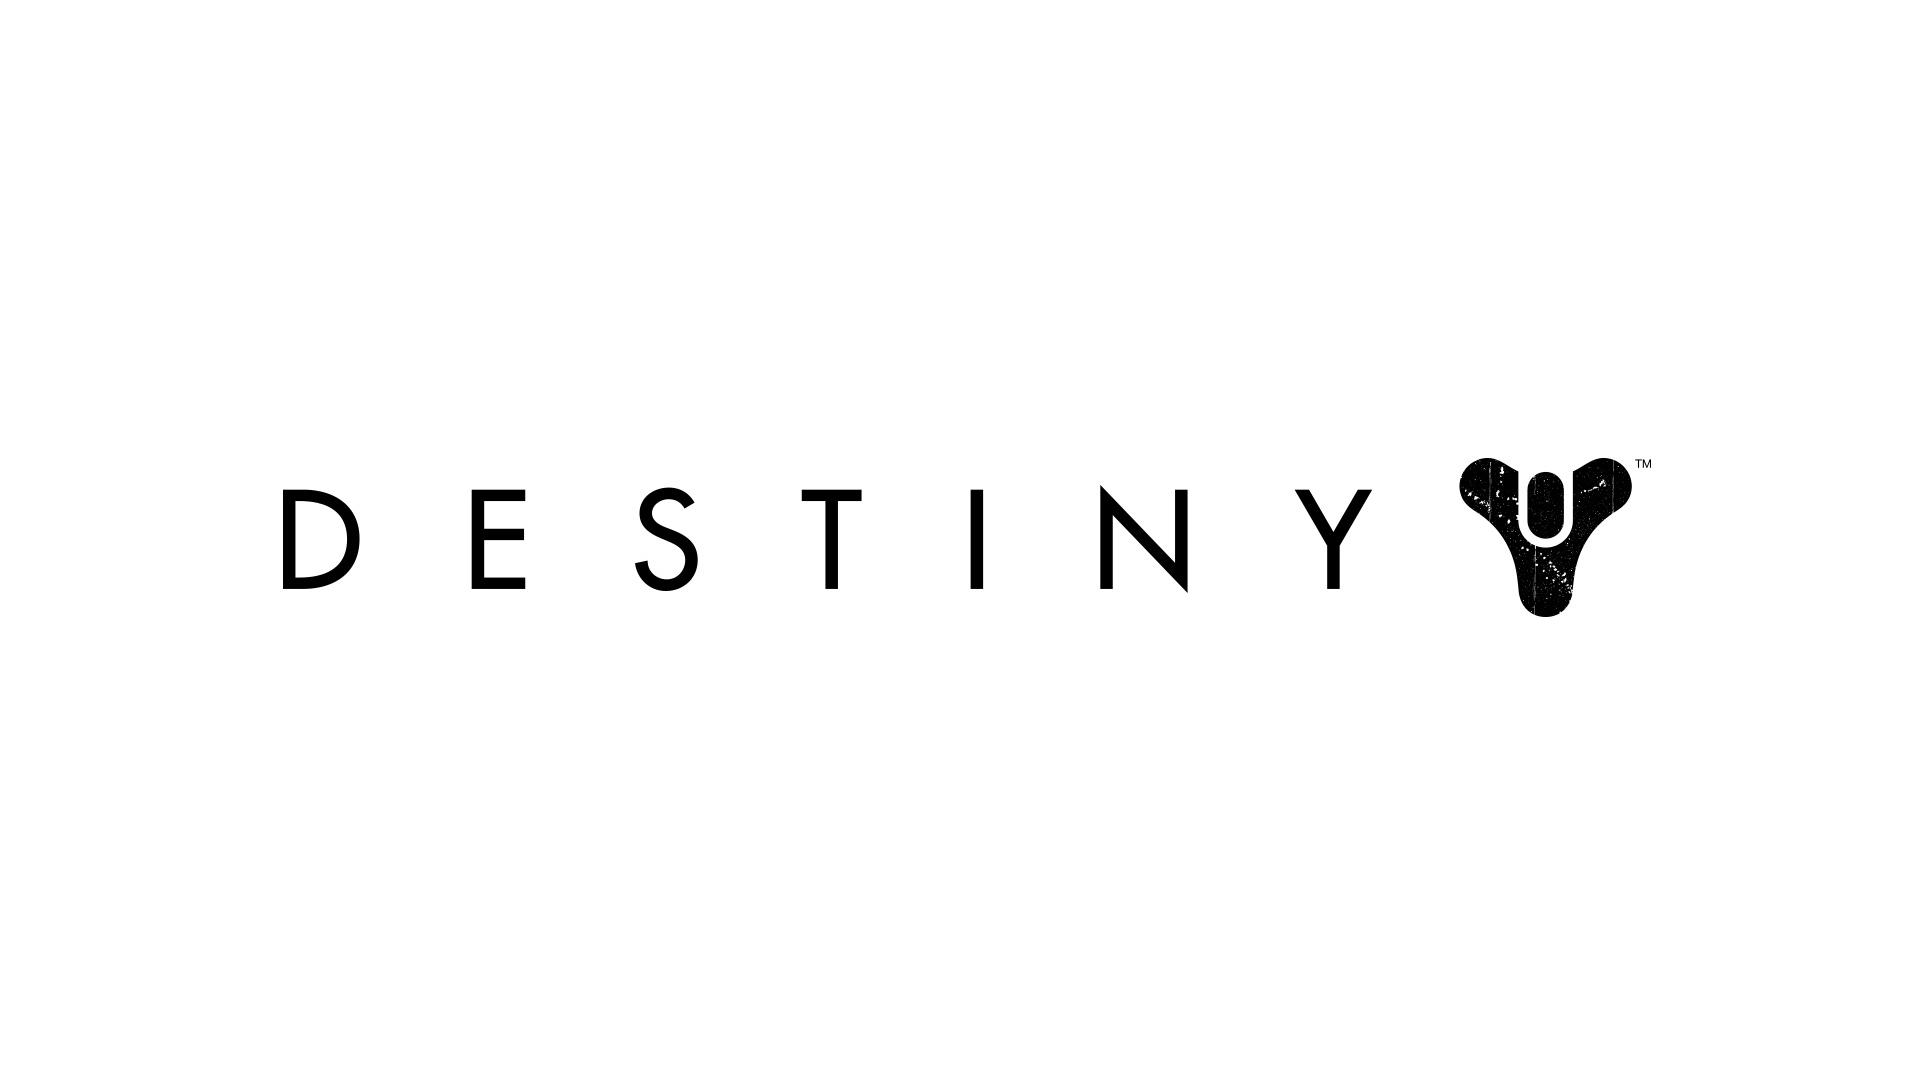 destiny logo hd - photo #4